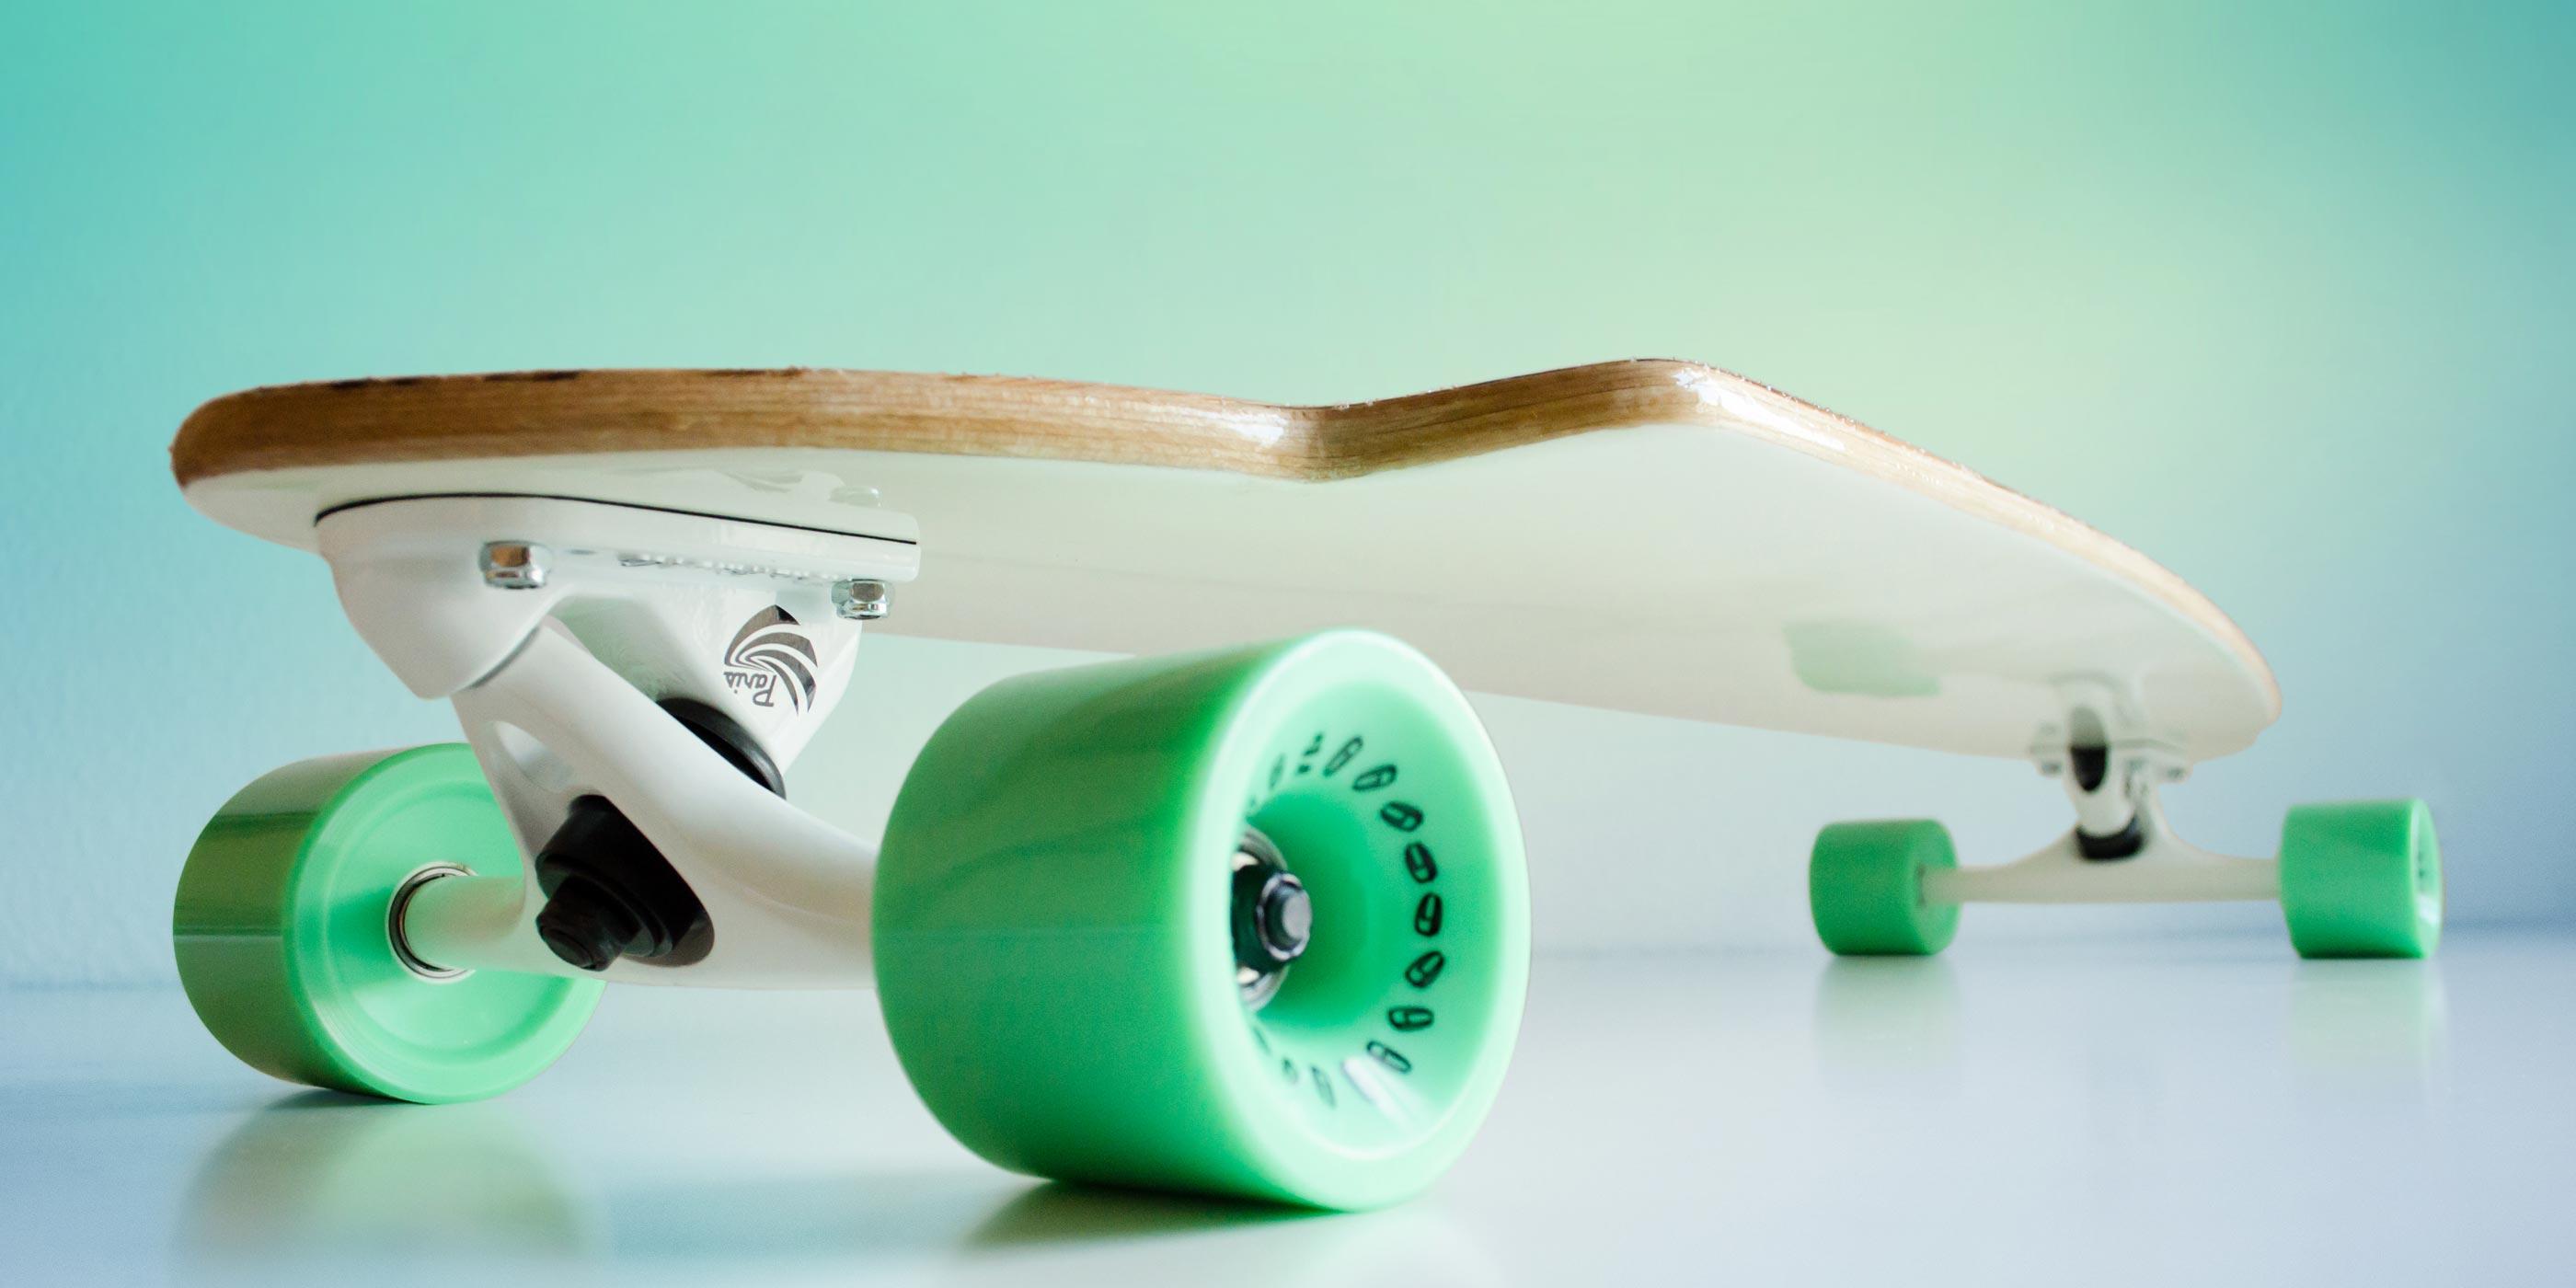 Longboard by WACH designstudio with Zebrano Deck, white bottom, Paris Trucks and turquoise Olson&Hekmati wheels